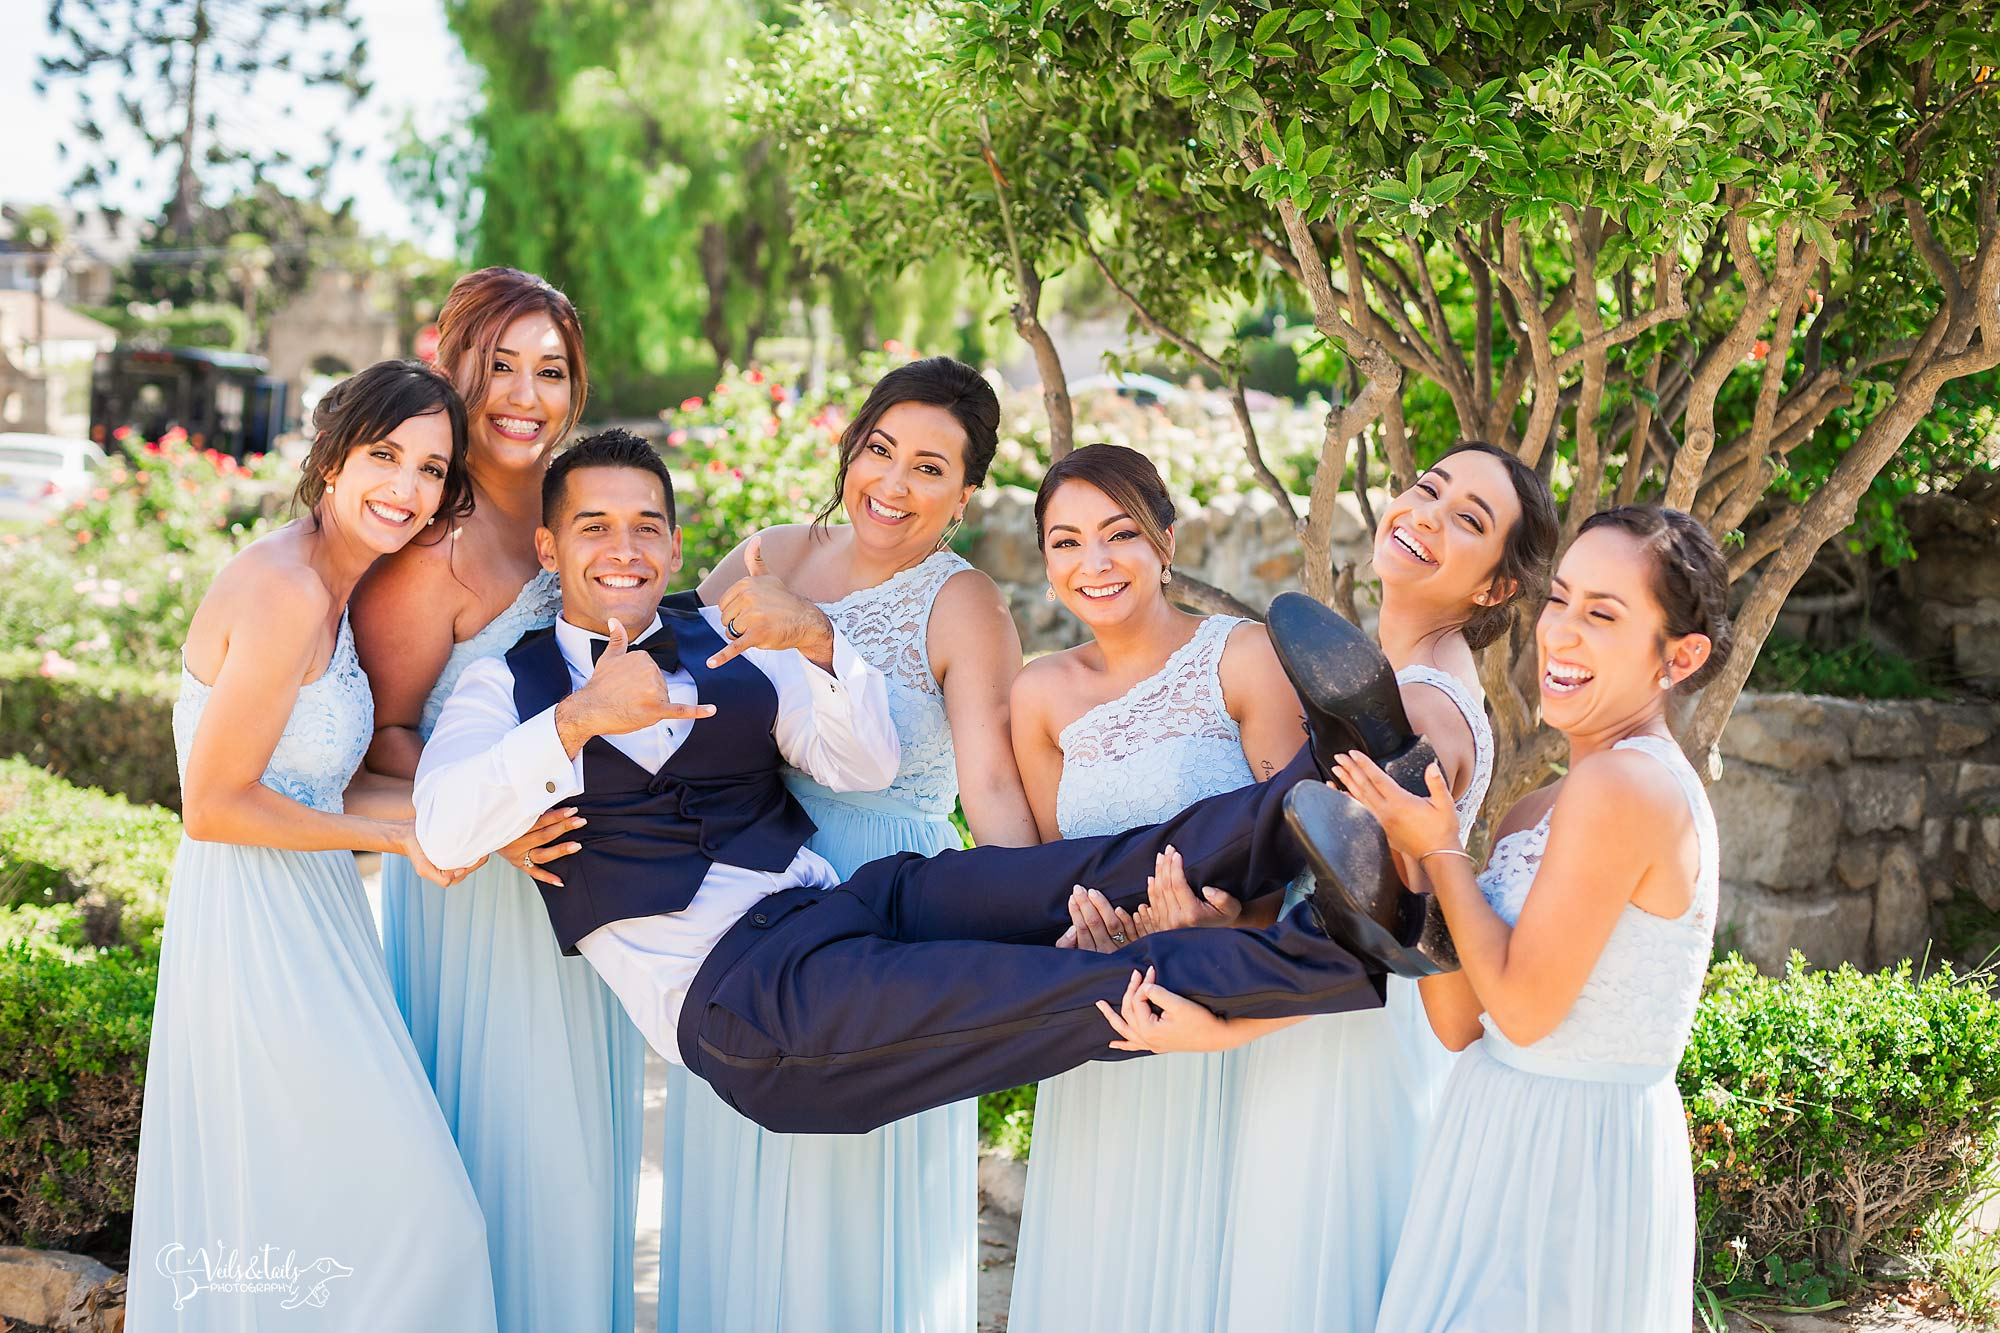 Santa Barbara Candid Wedding Photographer